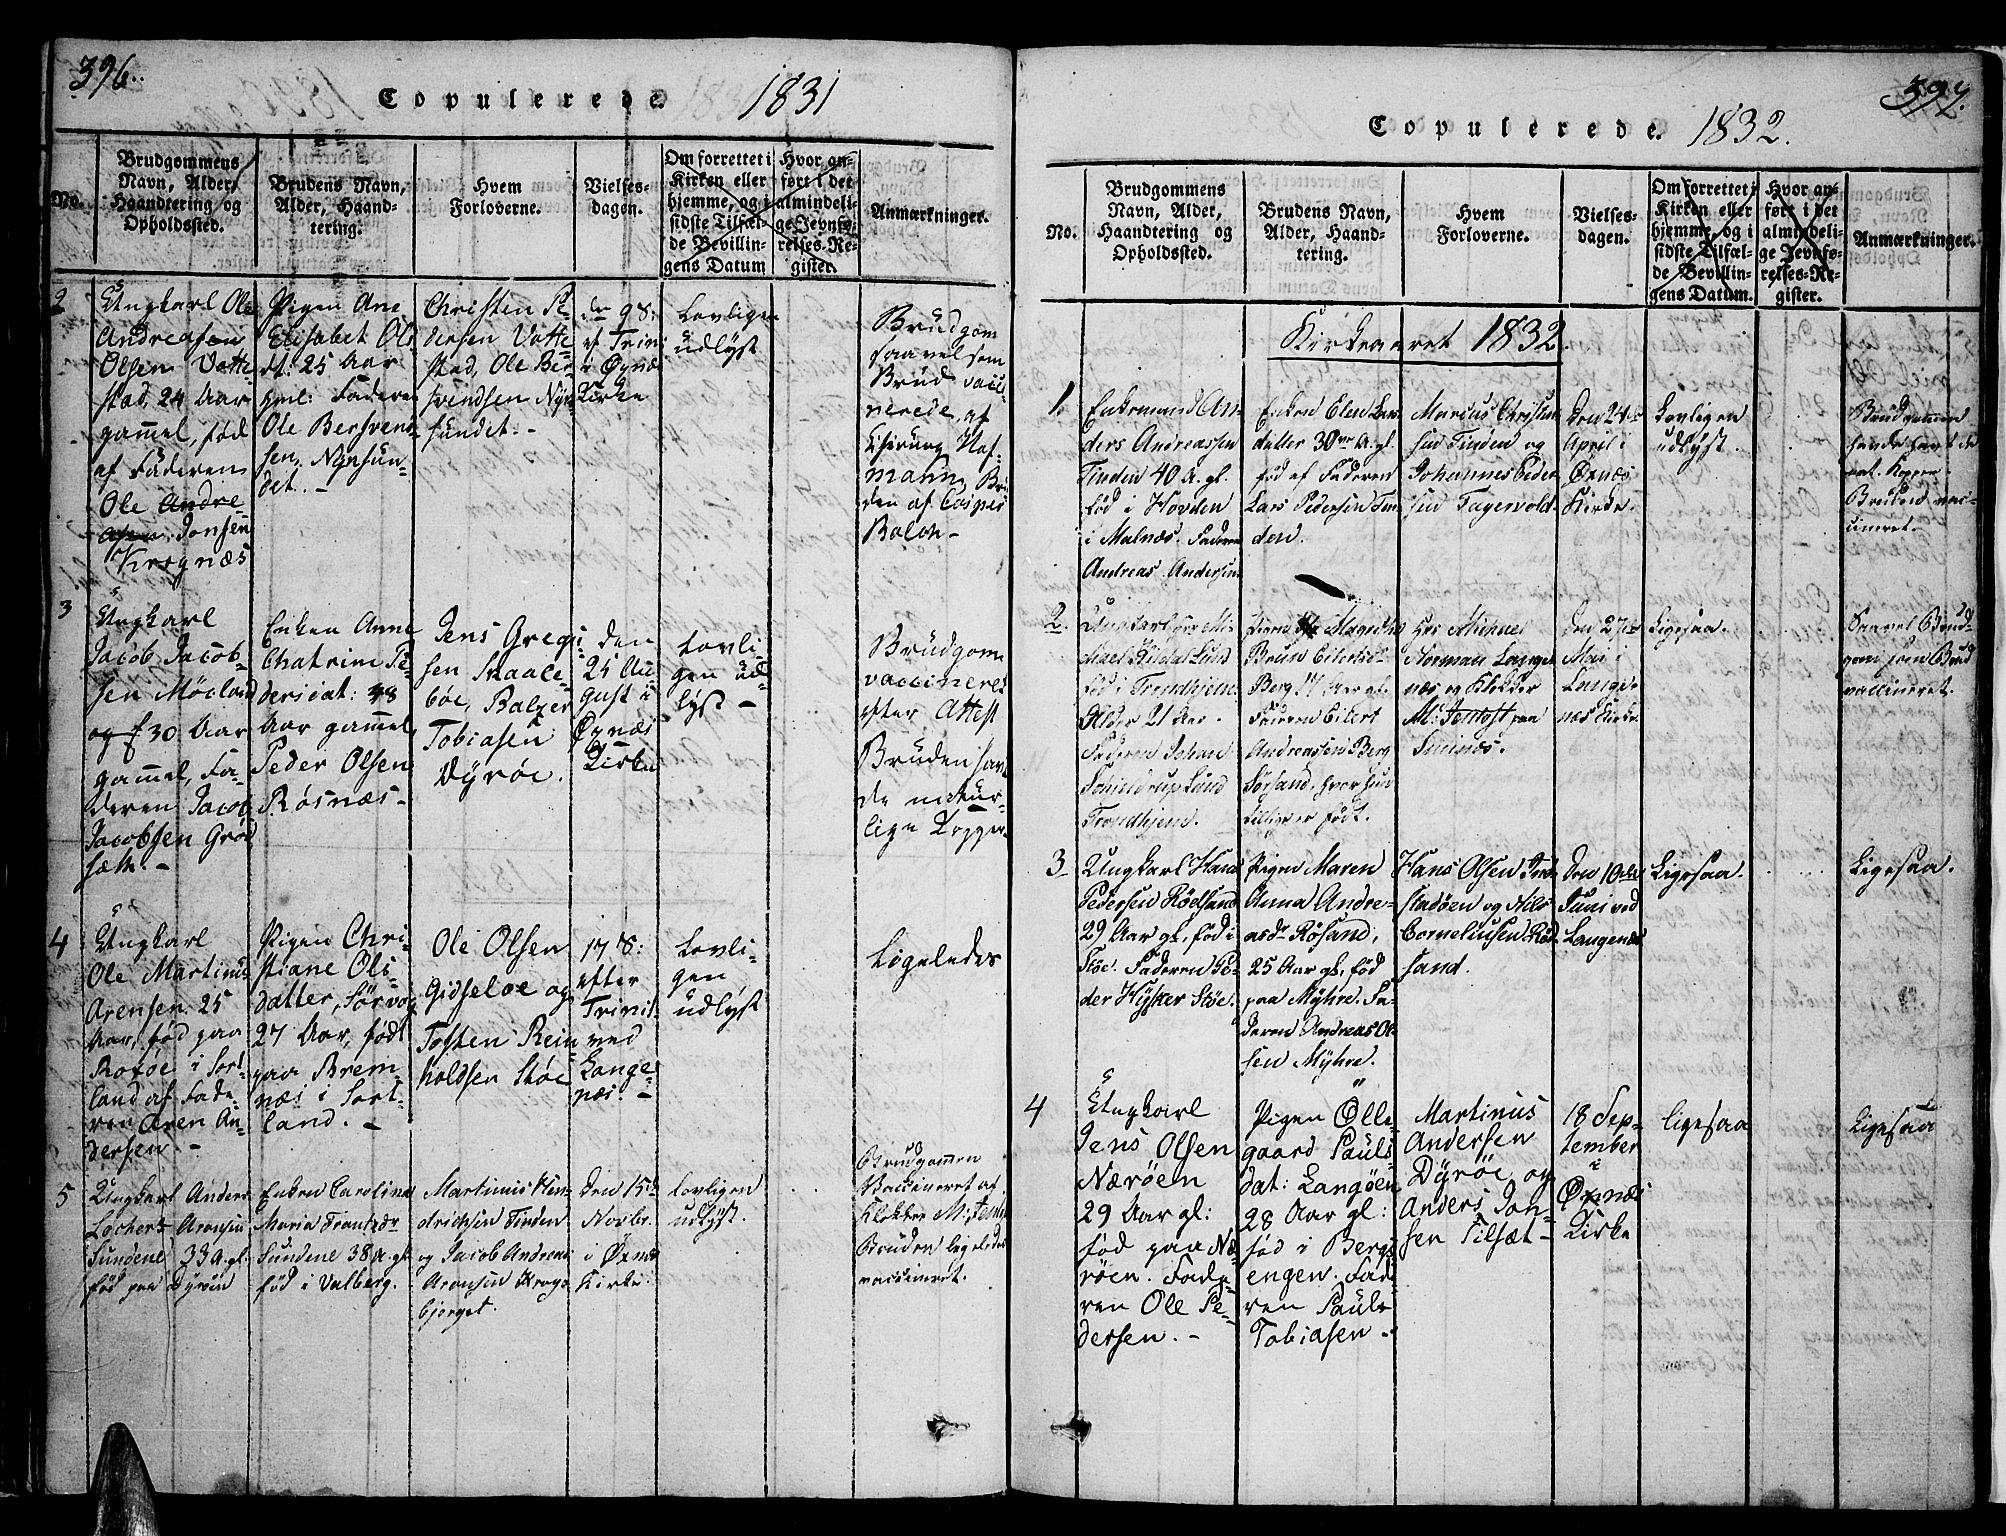 SAT, Ministerialprotokoller, klokkerbøker og fødselsregistre - Nordland, 893/L1331: Ministerialbok nr. 893A04, 1820-1840, s. 396-397